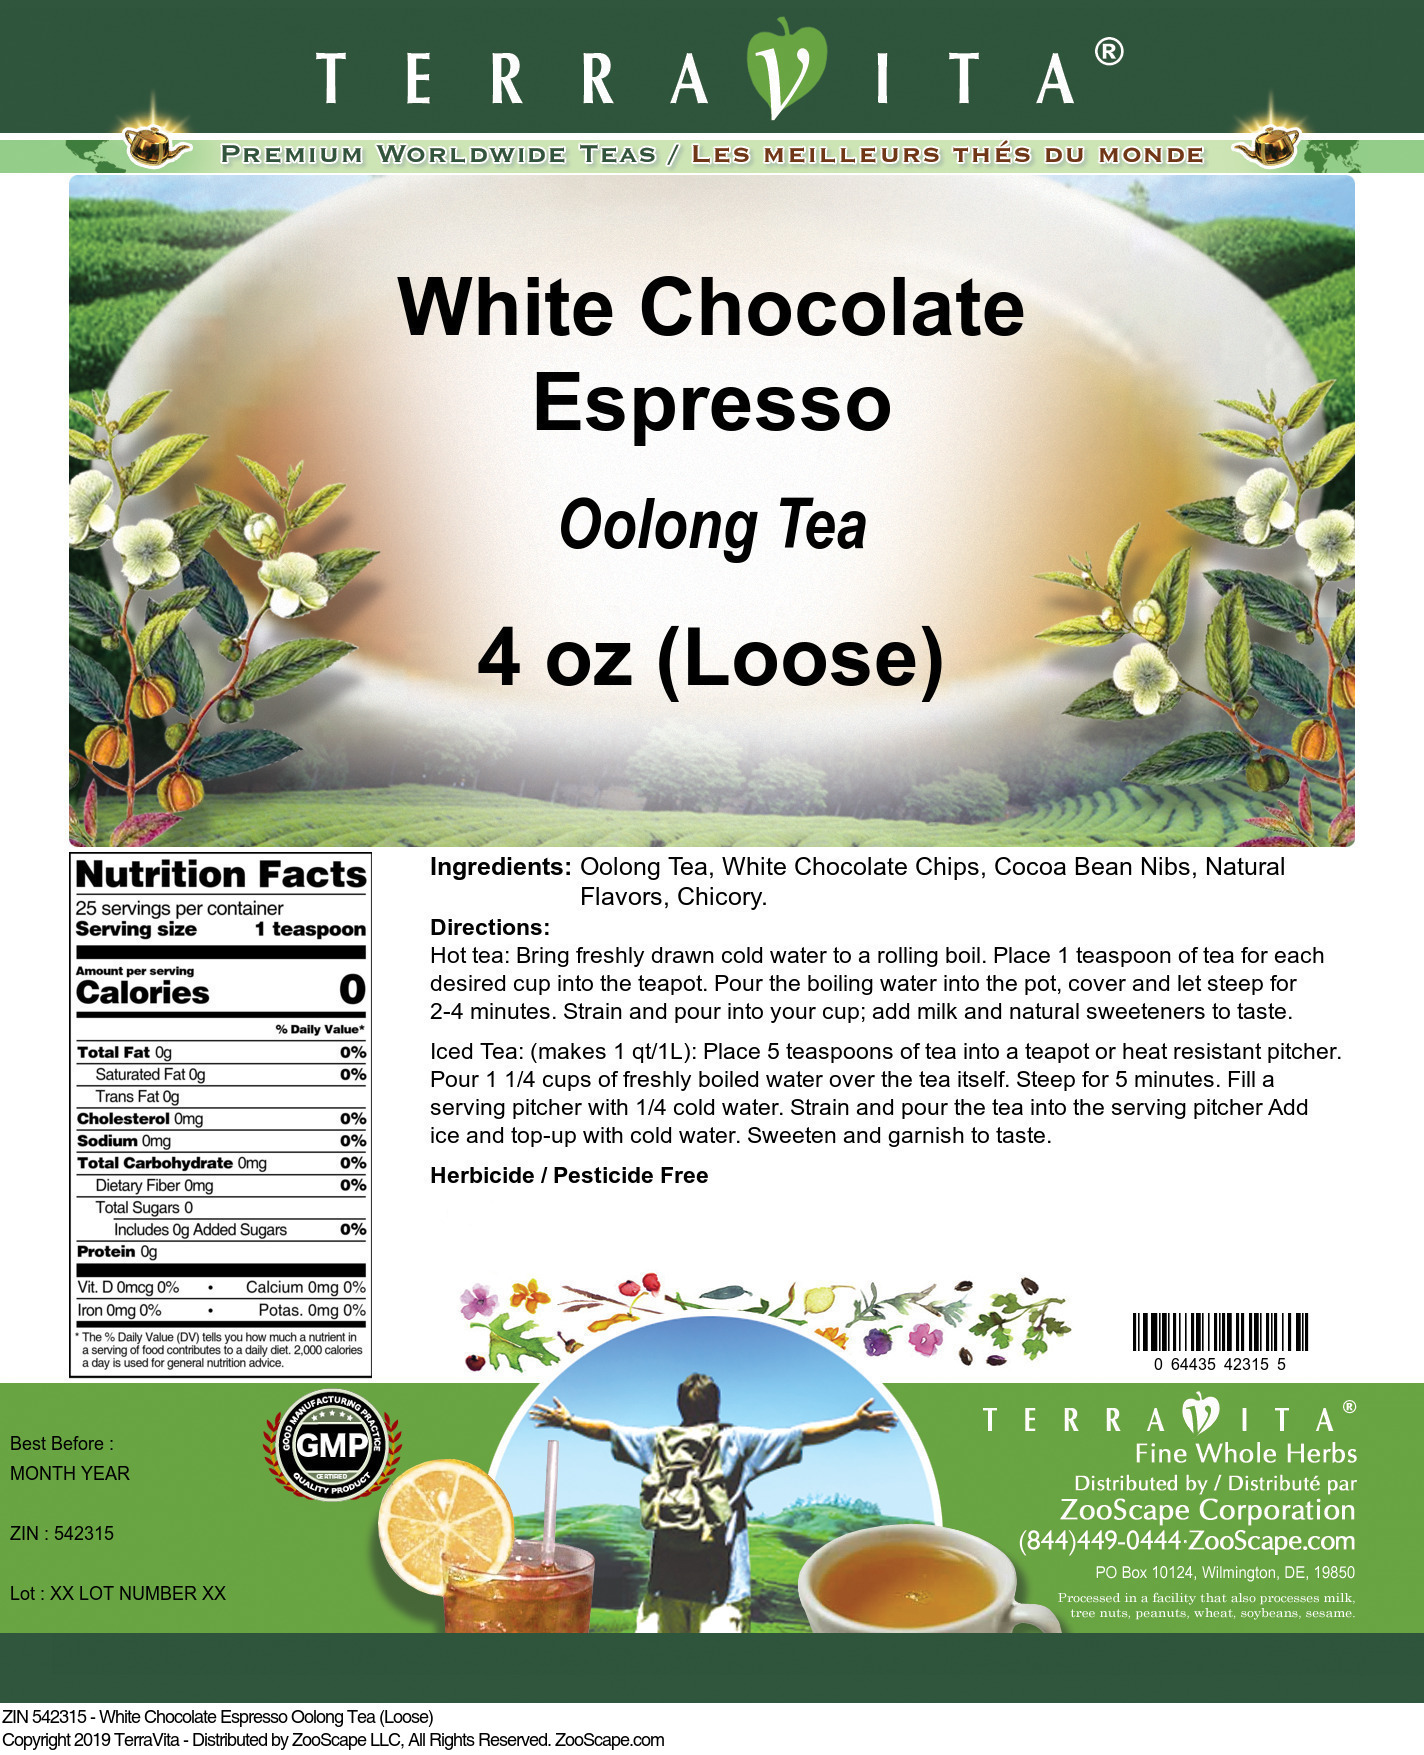 White Chocolate Espresso Oolong Tea